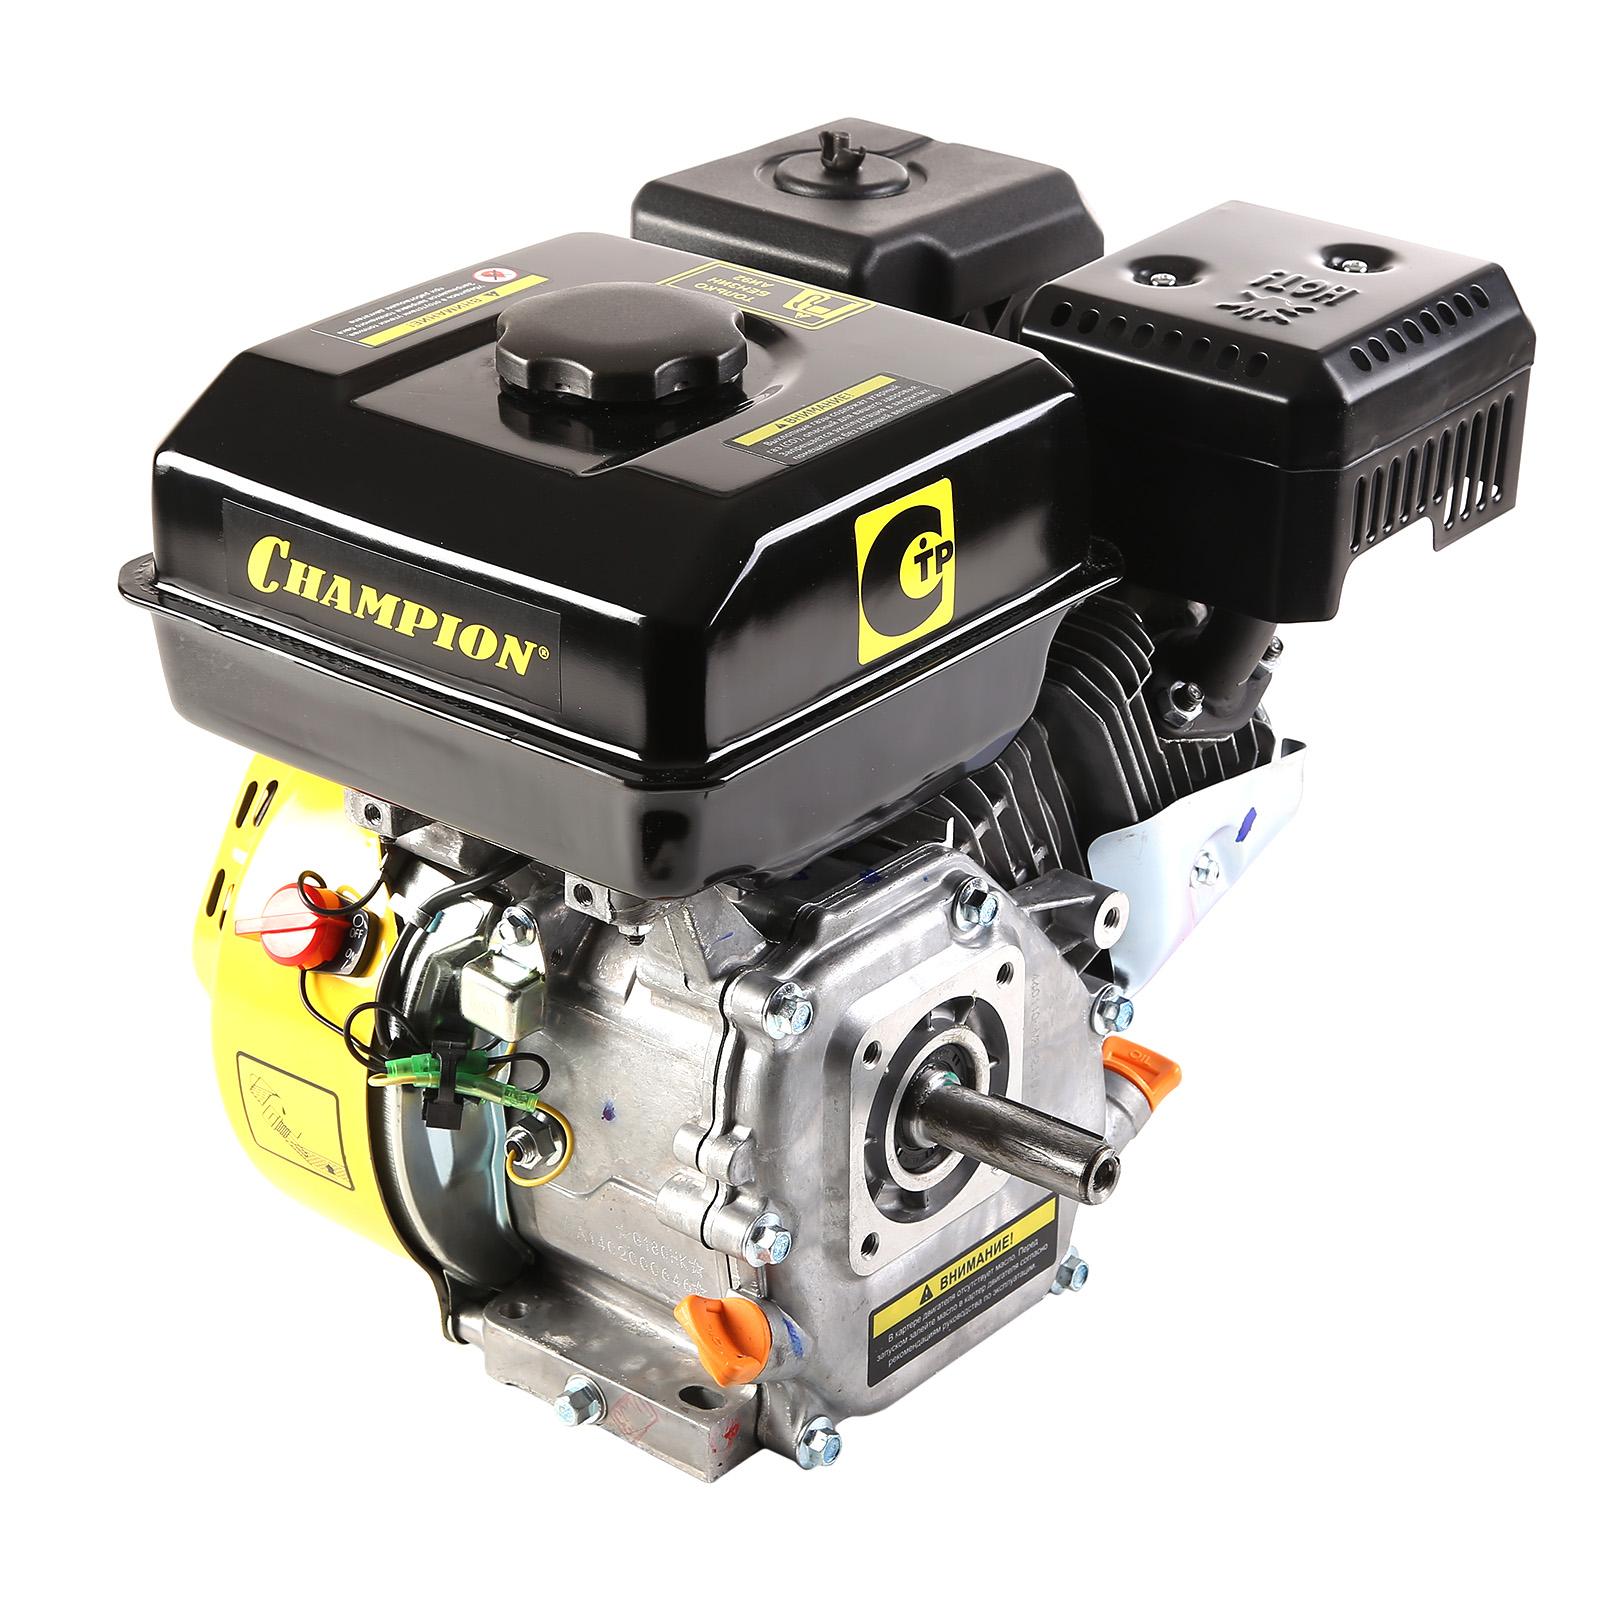 Двигатель Champion G180hk домкрат белак бак 00038 50т